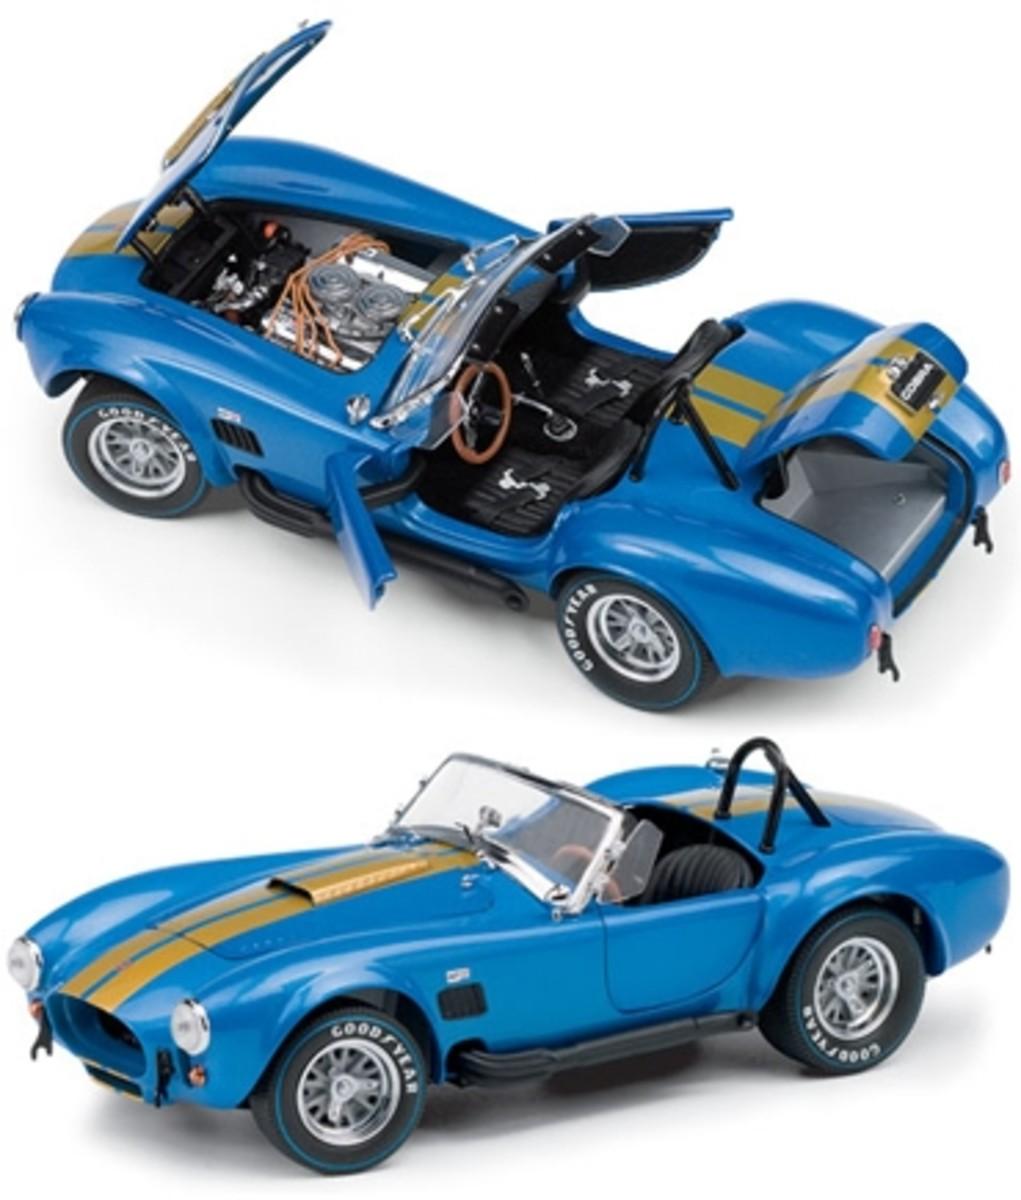 1966 Shelby Cobra 427 S/C Blue Diecast by Franklin Mint